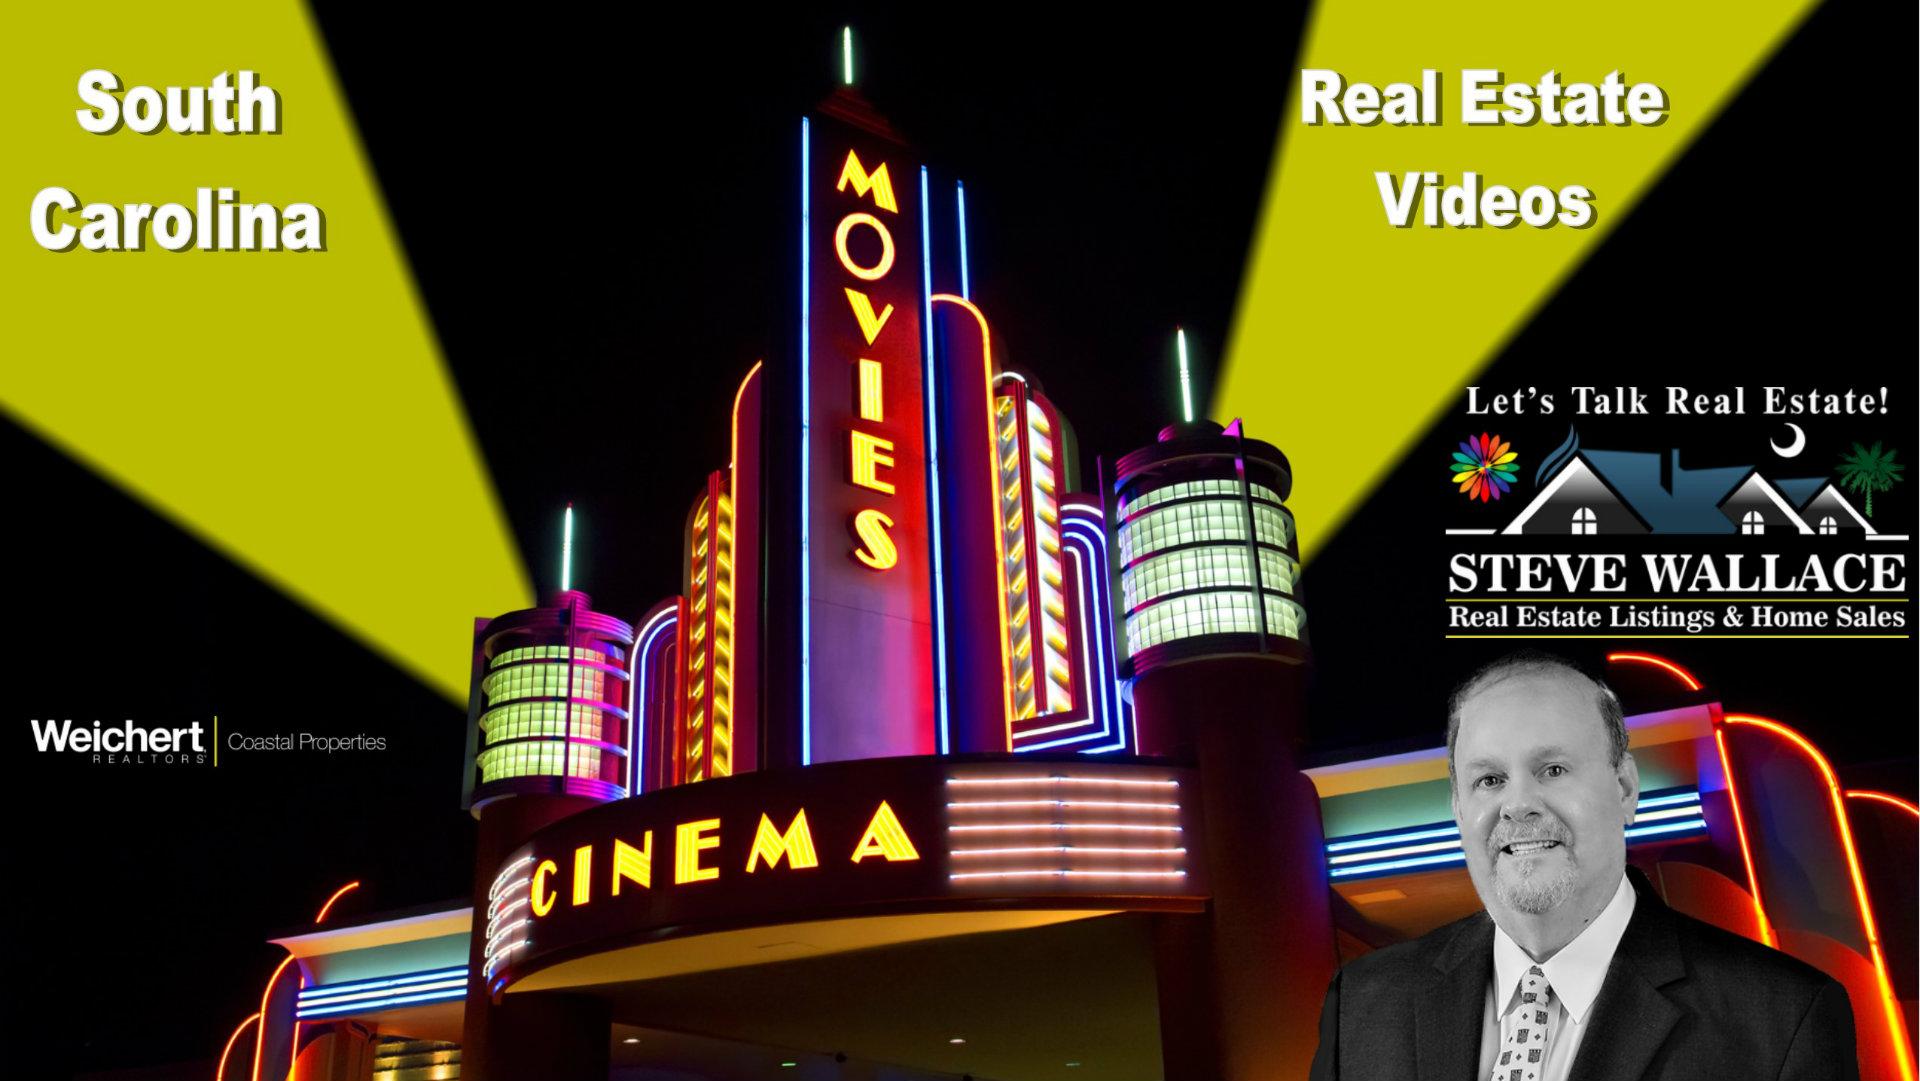 Greater, Bluffton, SC, South Carolina, Real Estate Videos, Realtor, Agent, Steve Wallace